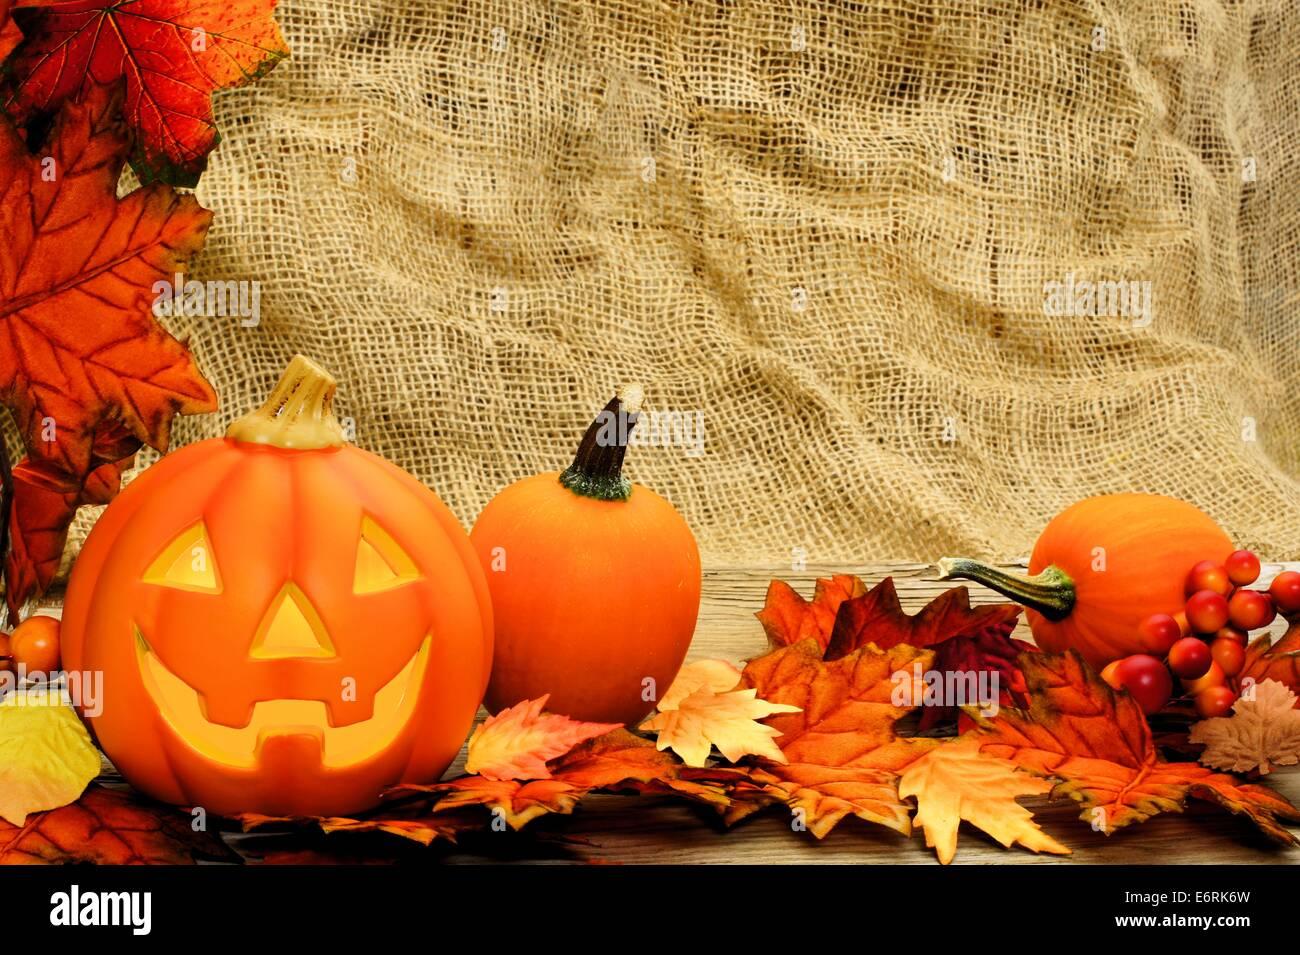 Halloween Jack O Lantern And Leaf Border With Burlap Background Stock Photo Alamy